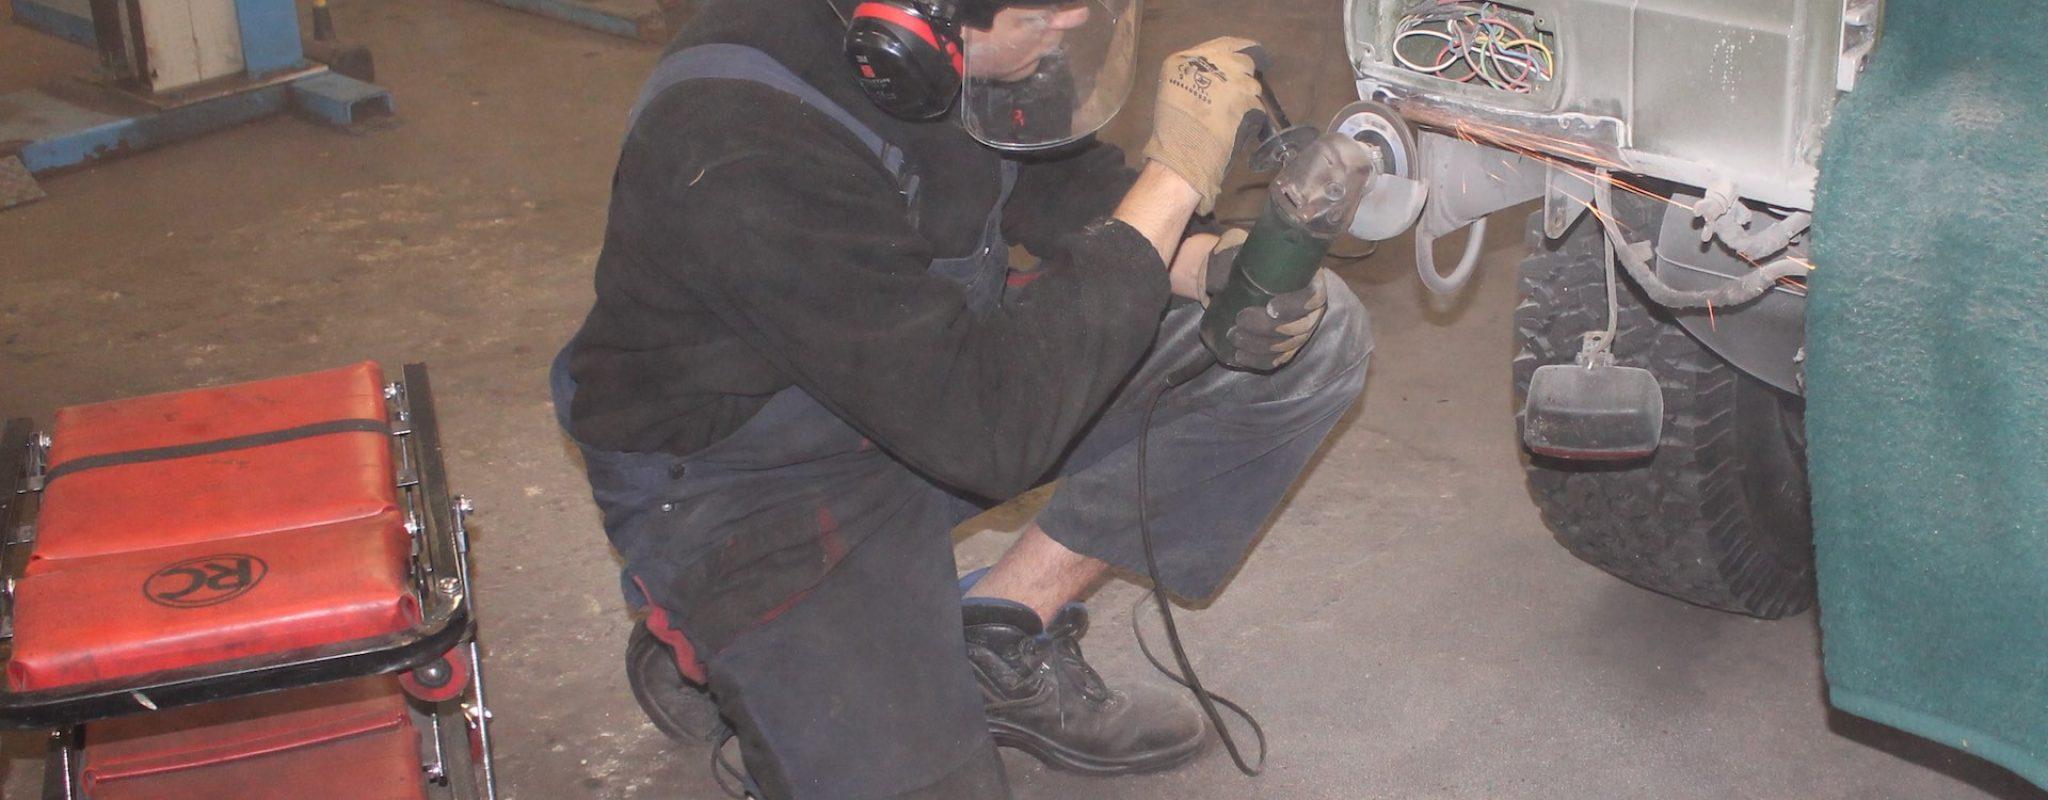 OptimAG Projekt worker